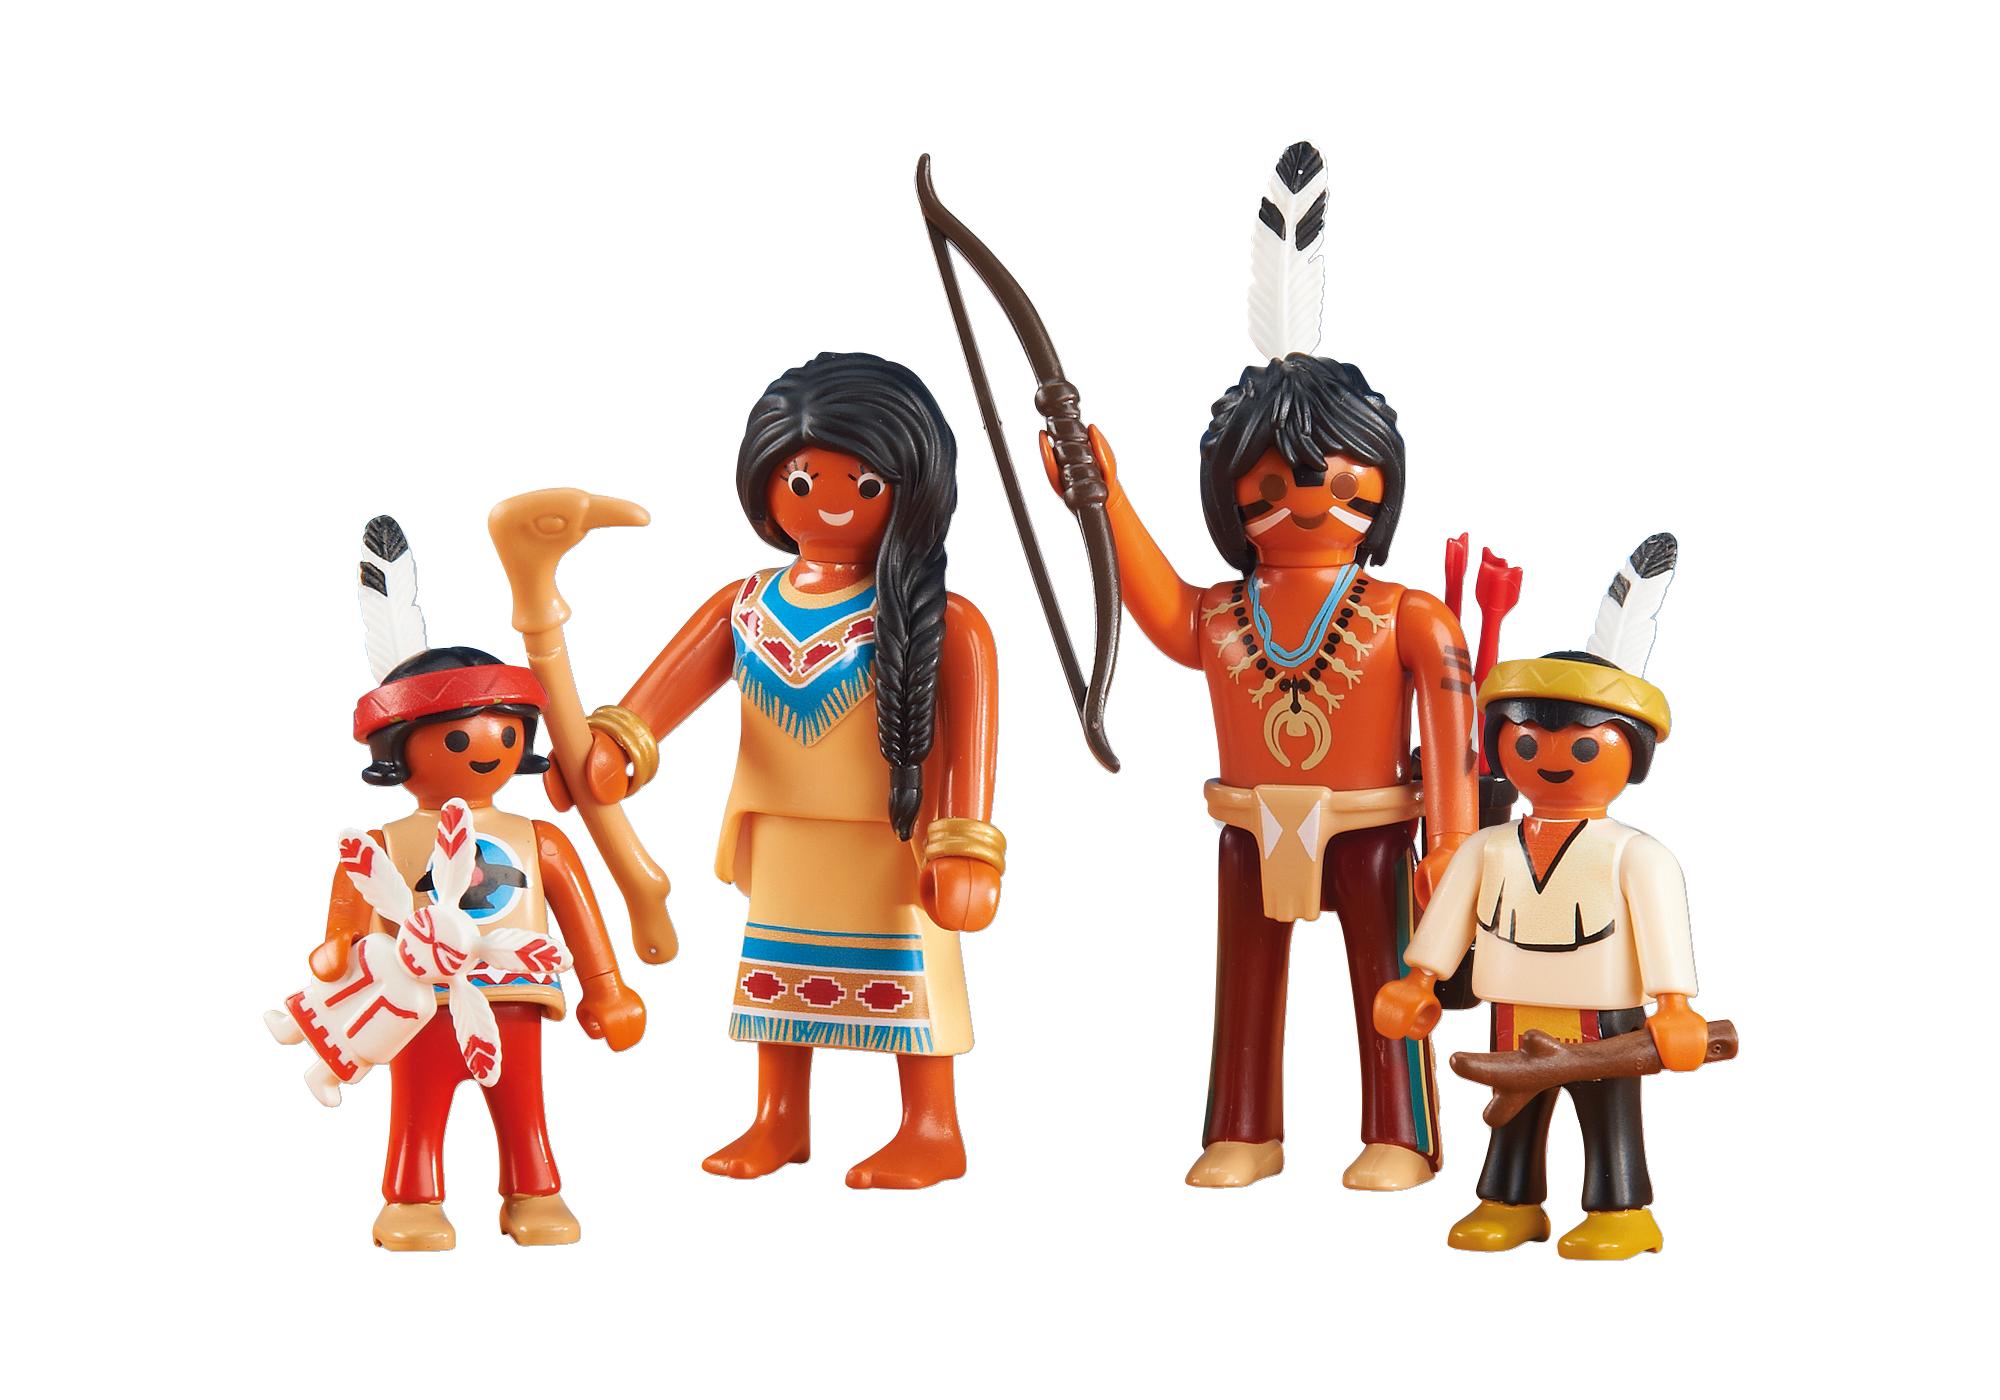 http://media.playmobil.com/i/playmobil/6322_product_detail/Indianerfamilie